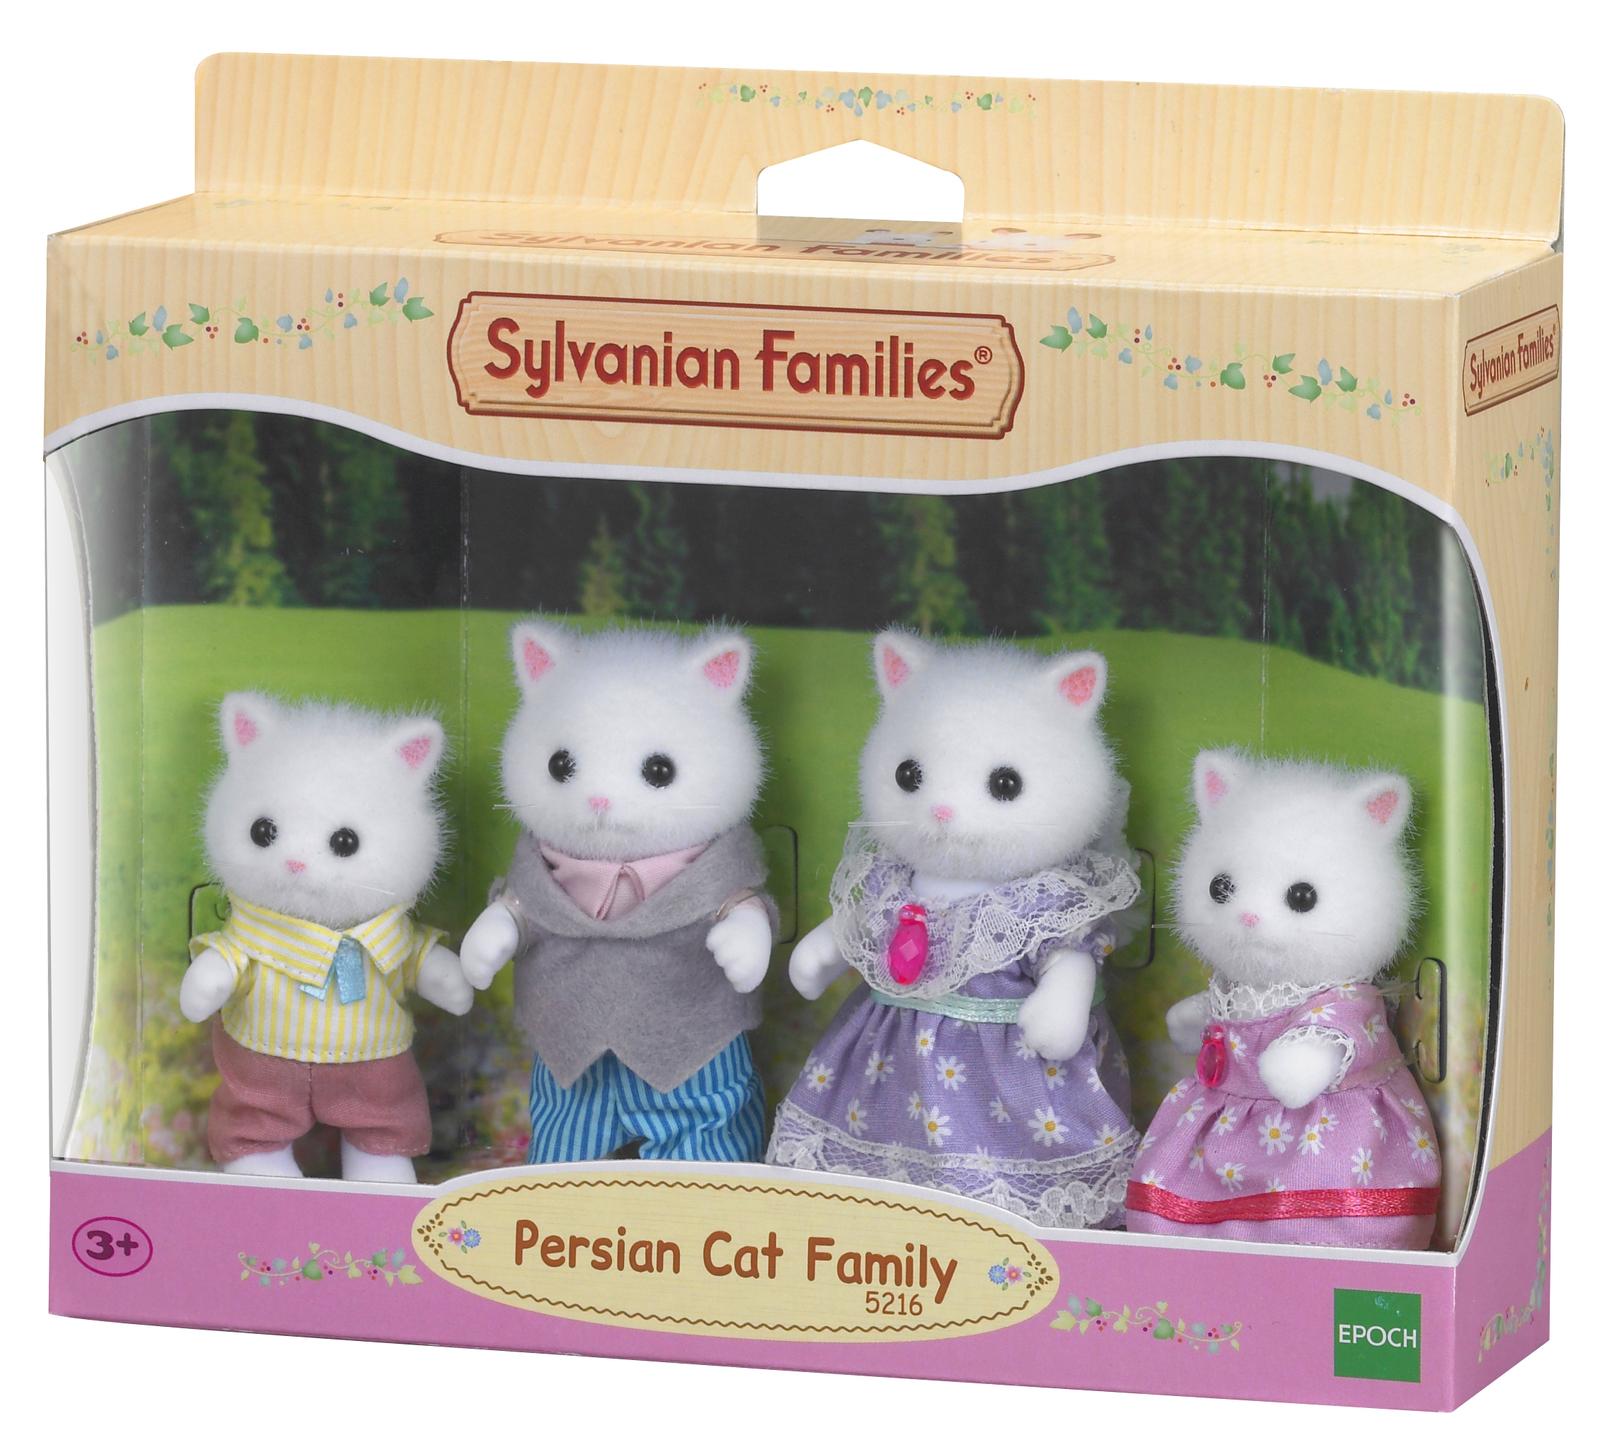 Sylvanian Families: Persian Cat Family image